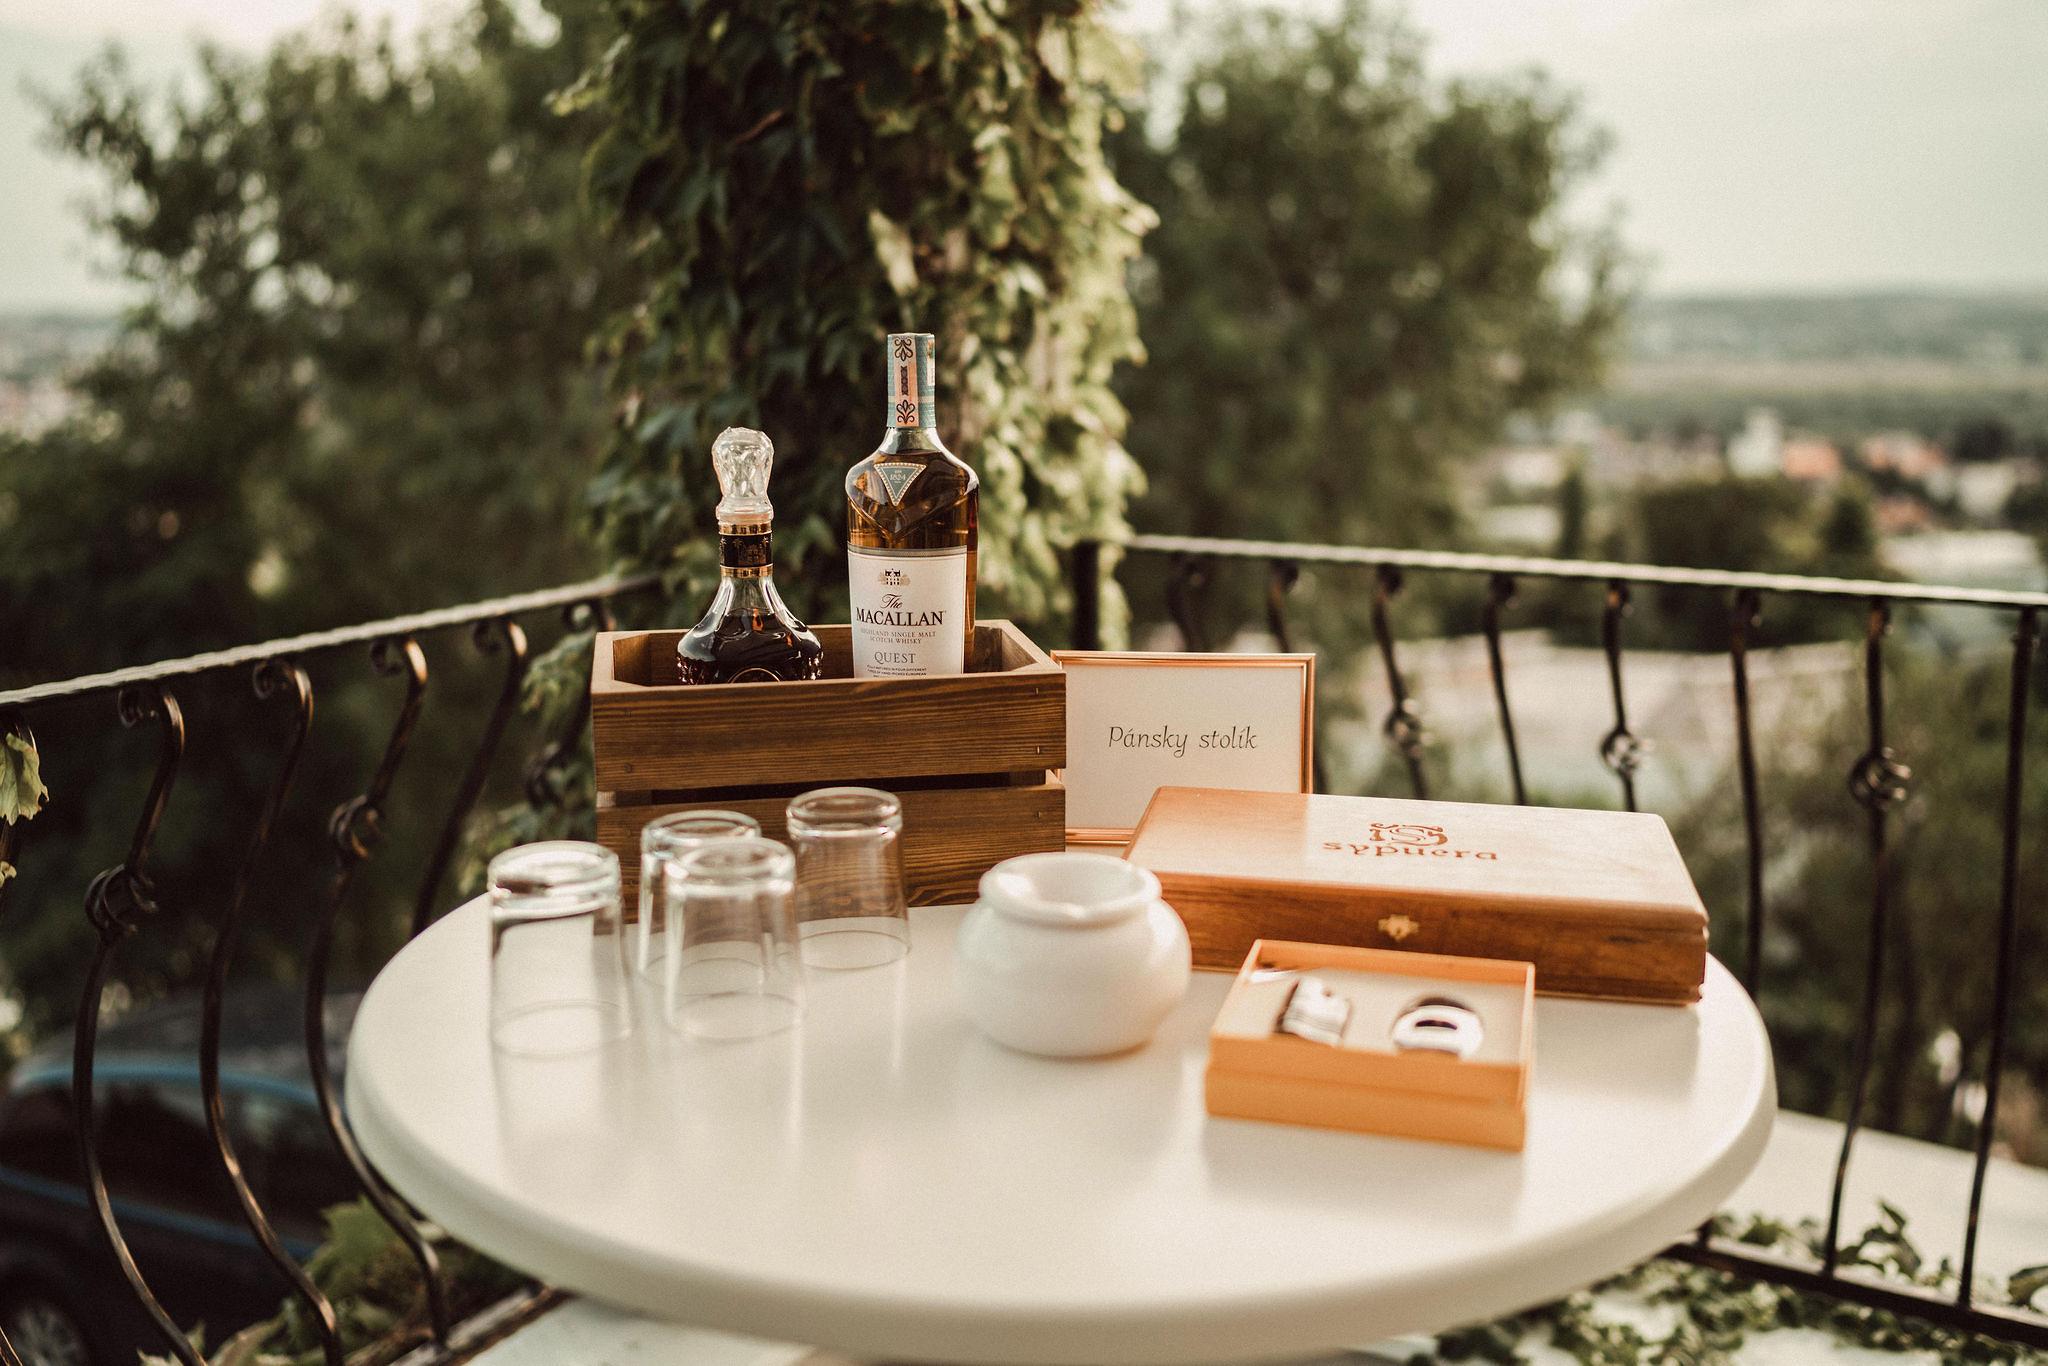 alkoholovy-bar-svadba-cenajpg